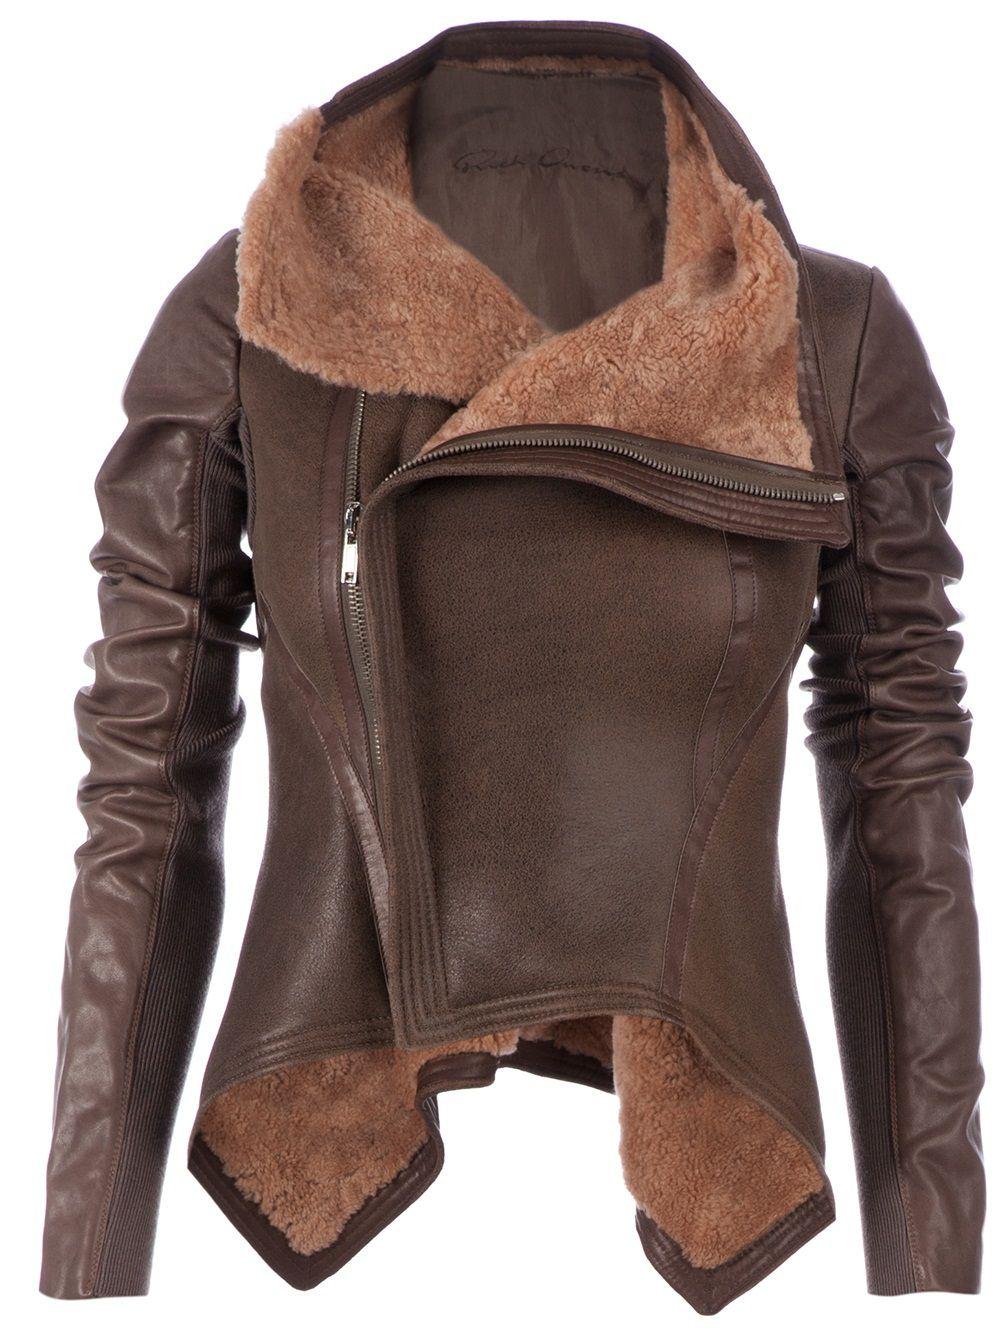 Designer Leather Jackets for Women - Fashion